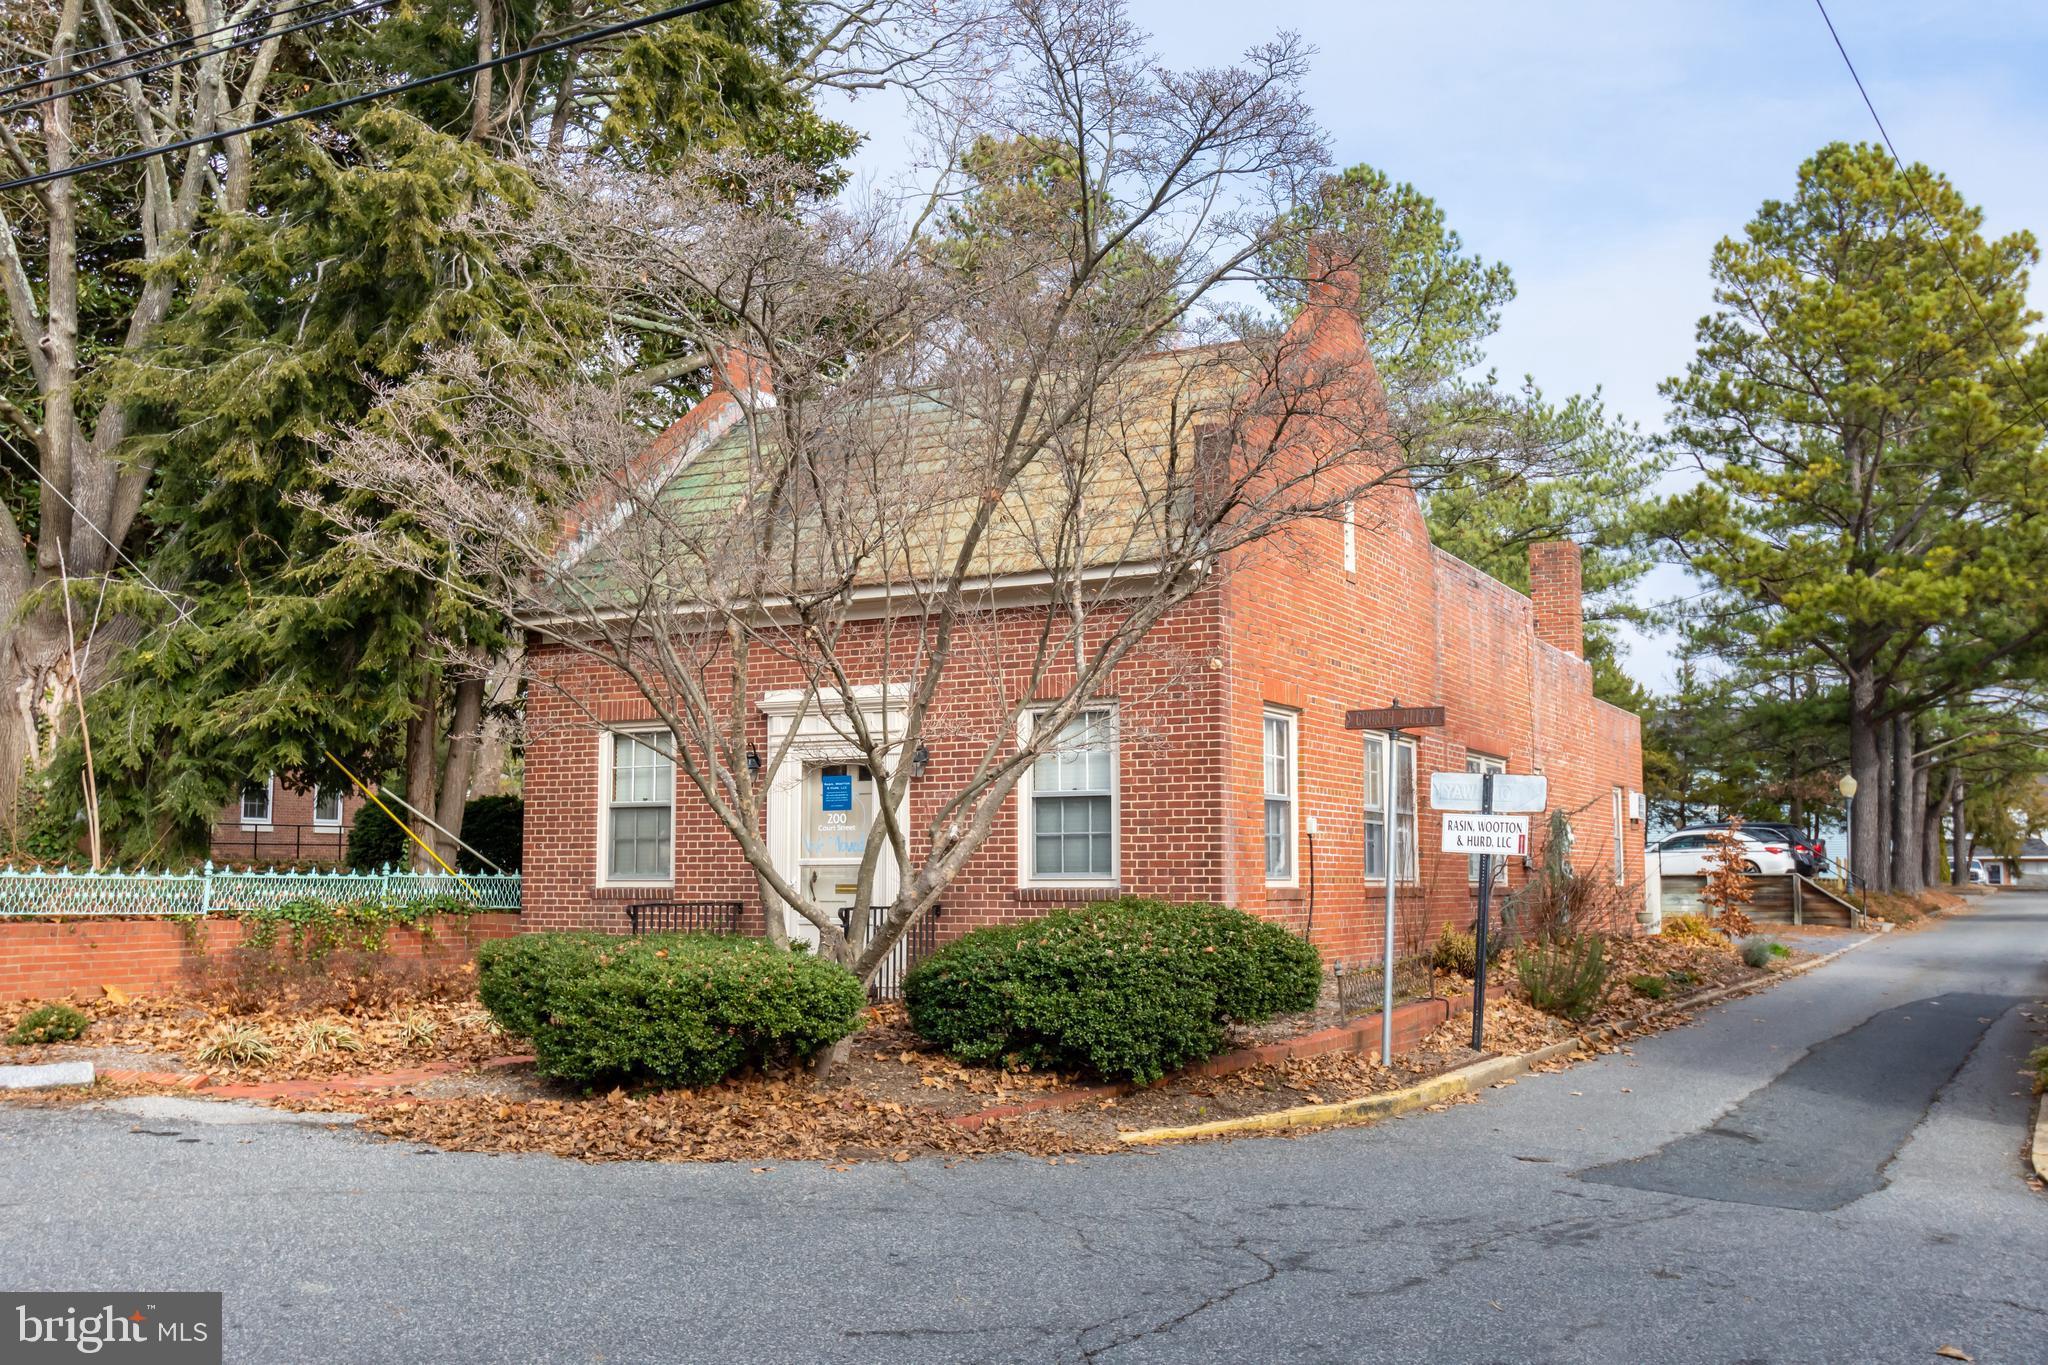 200 COURT STREET, CHESTERTOWN, Maryland 21620, ,Single Family,For Sale,200 COURT STREET,MDKE116074